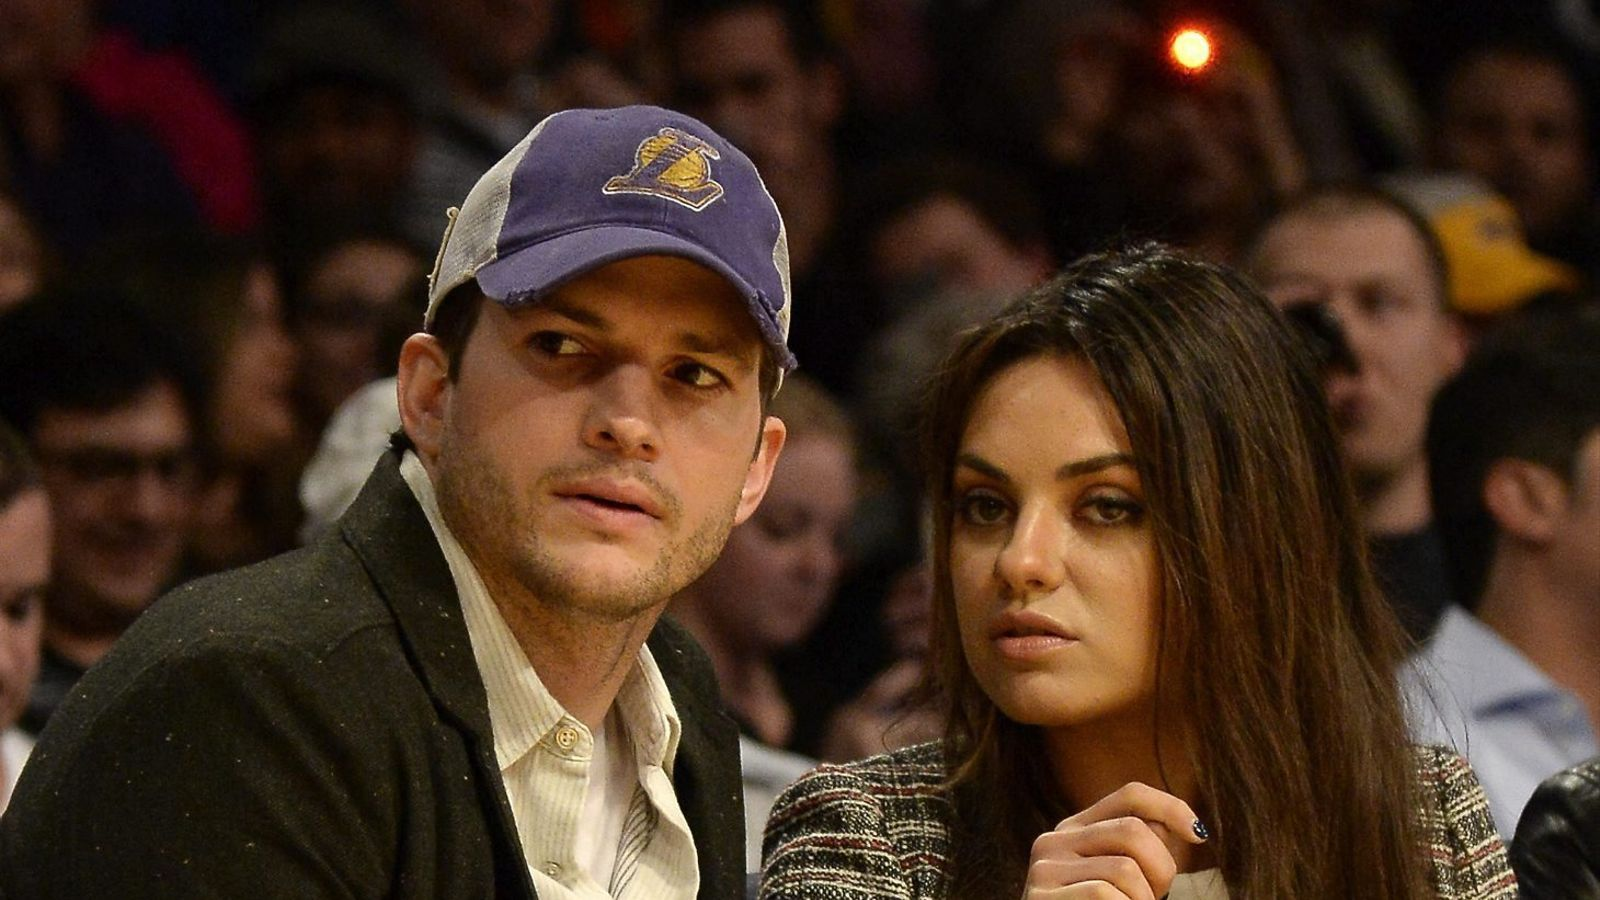 Kunis i Kutcher tornen a ser pares